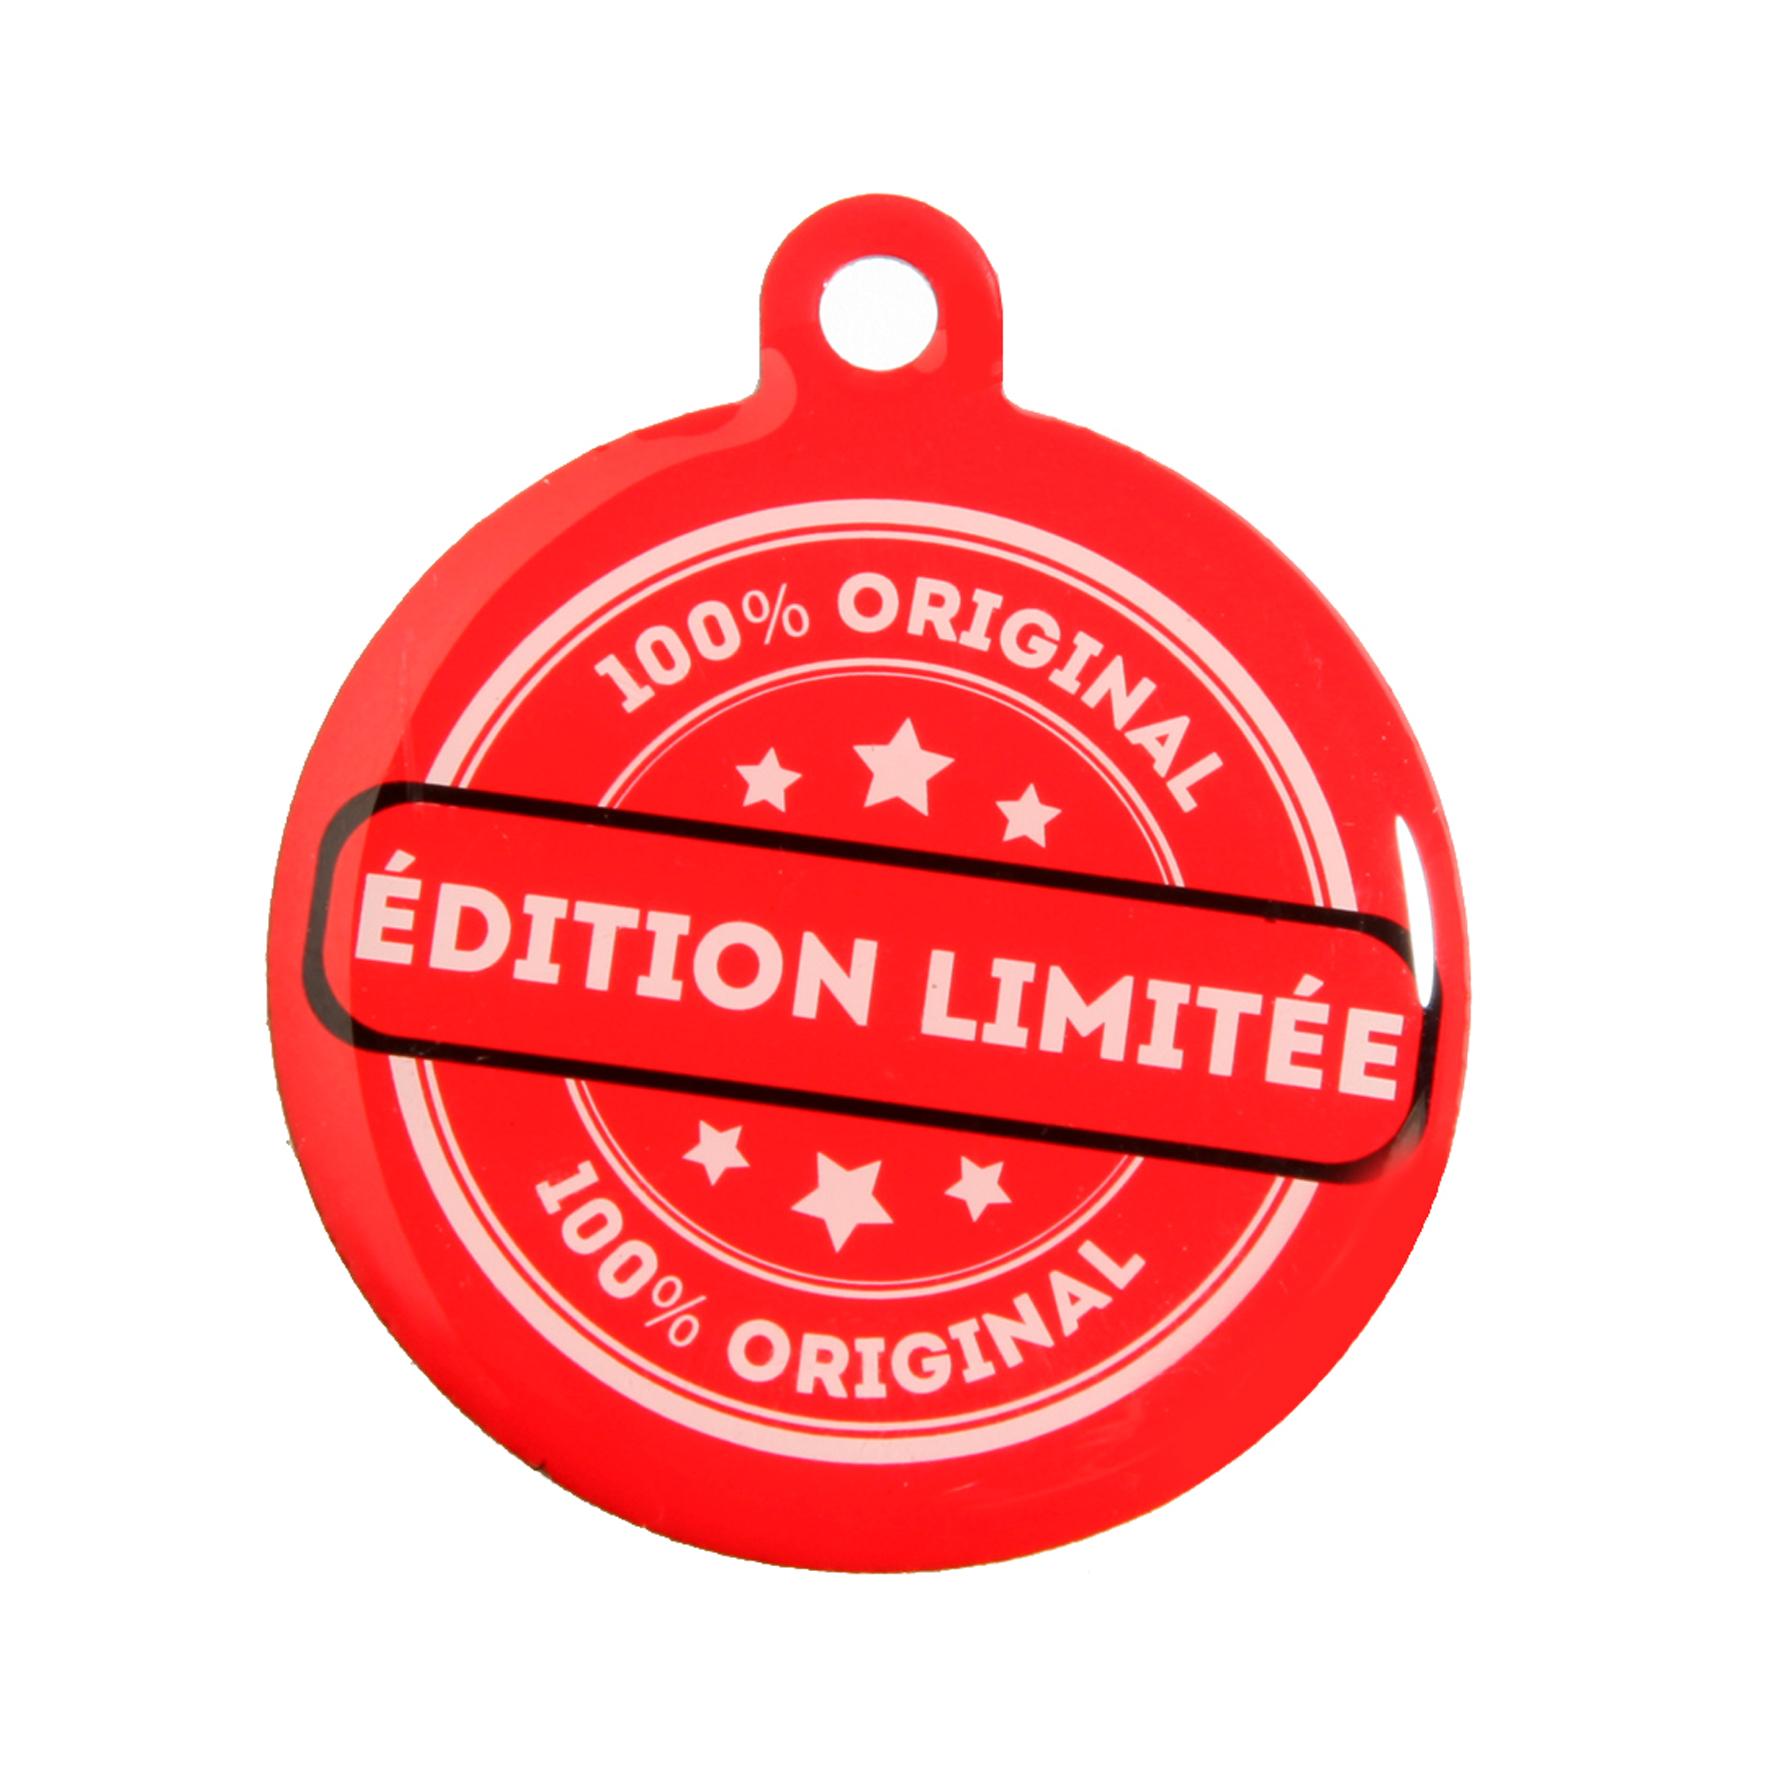 medaille chien qr code edition limitee